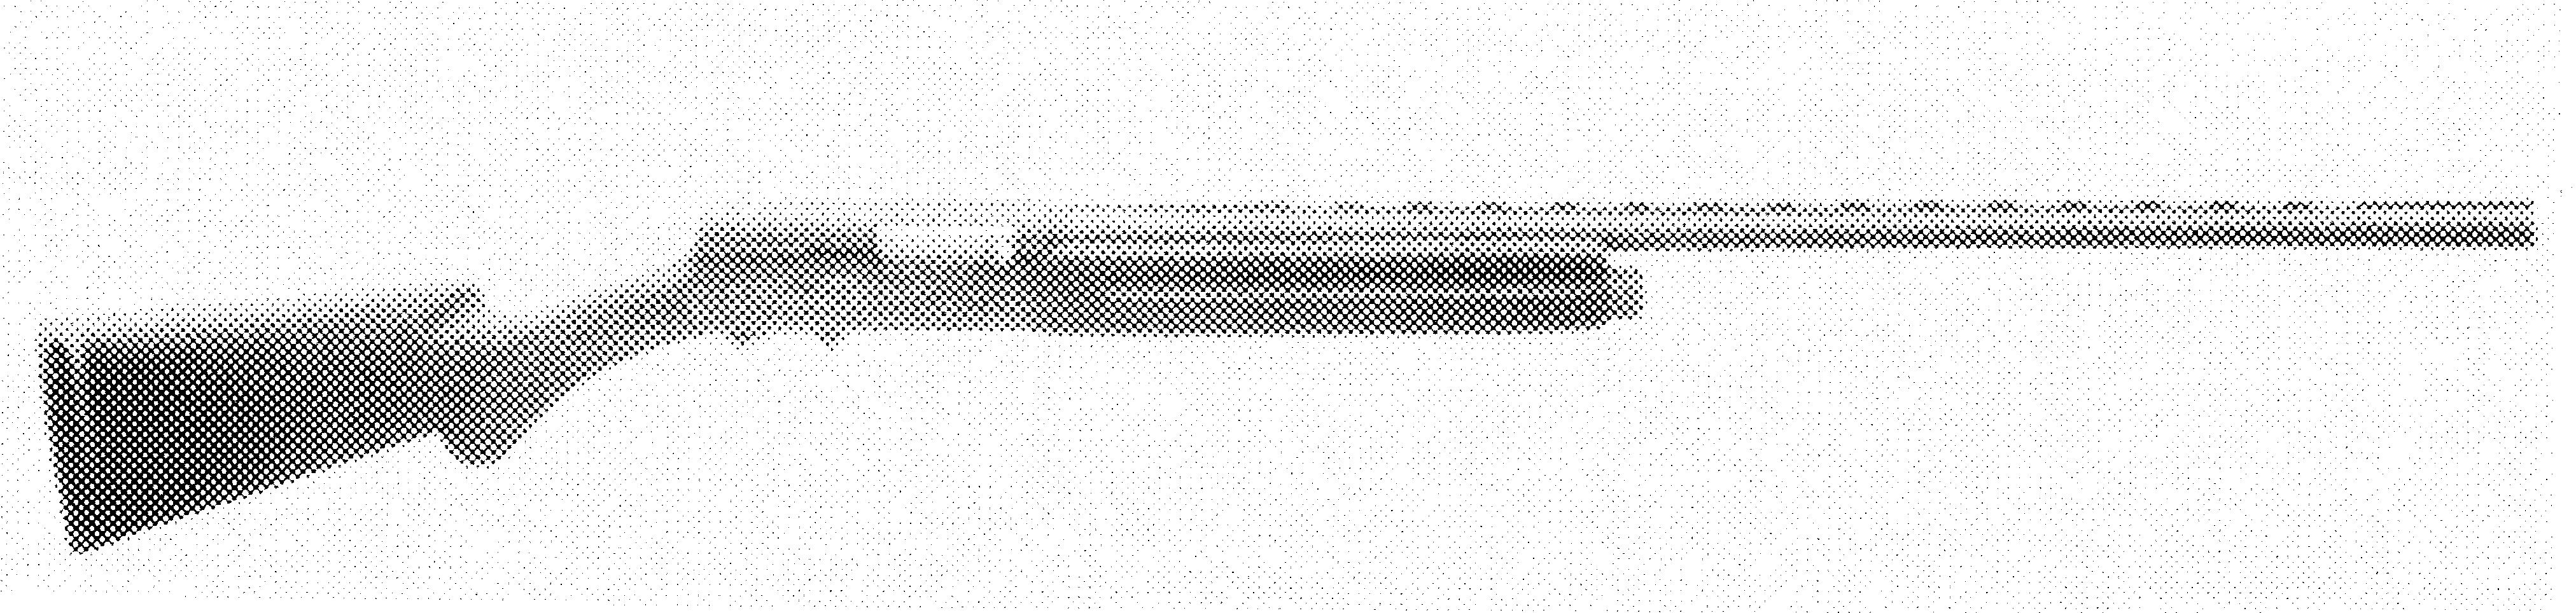 Auto-5 Stalker